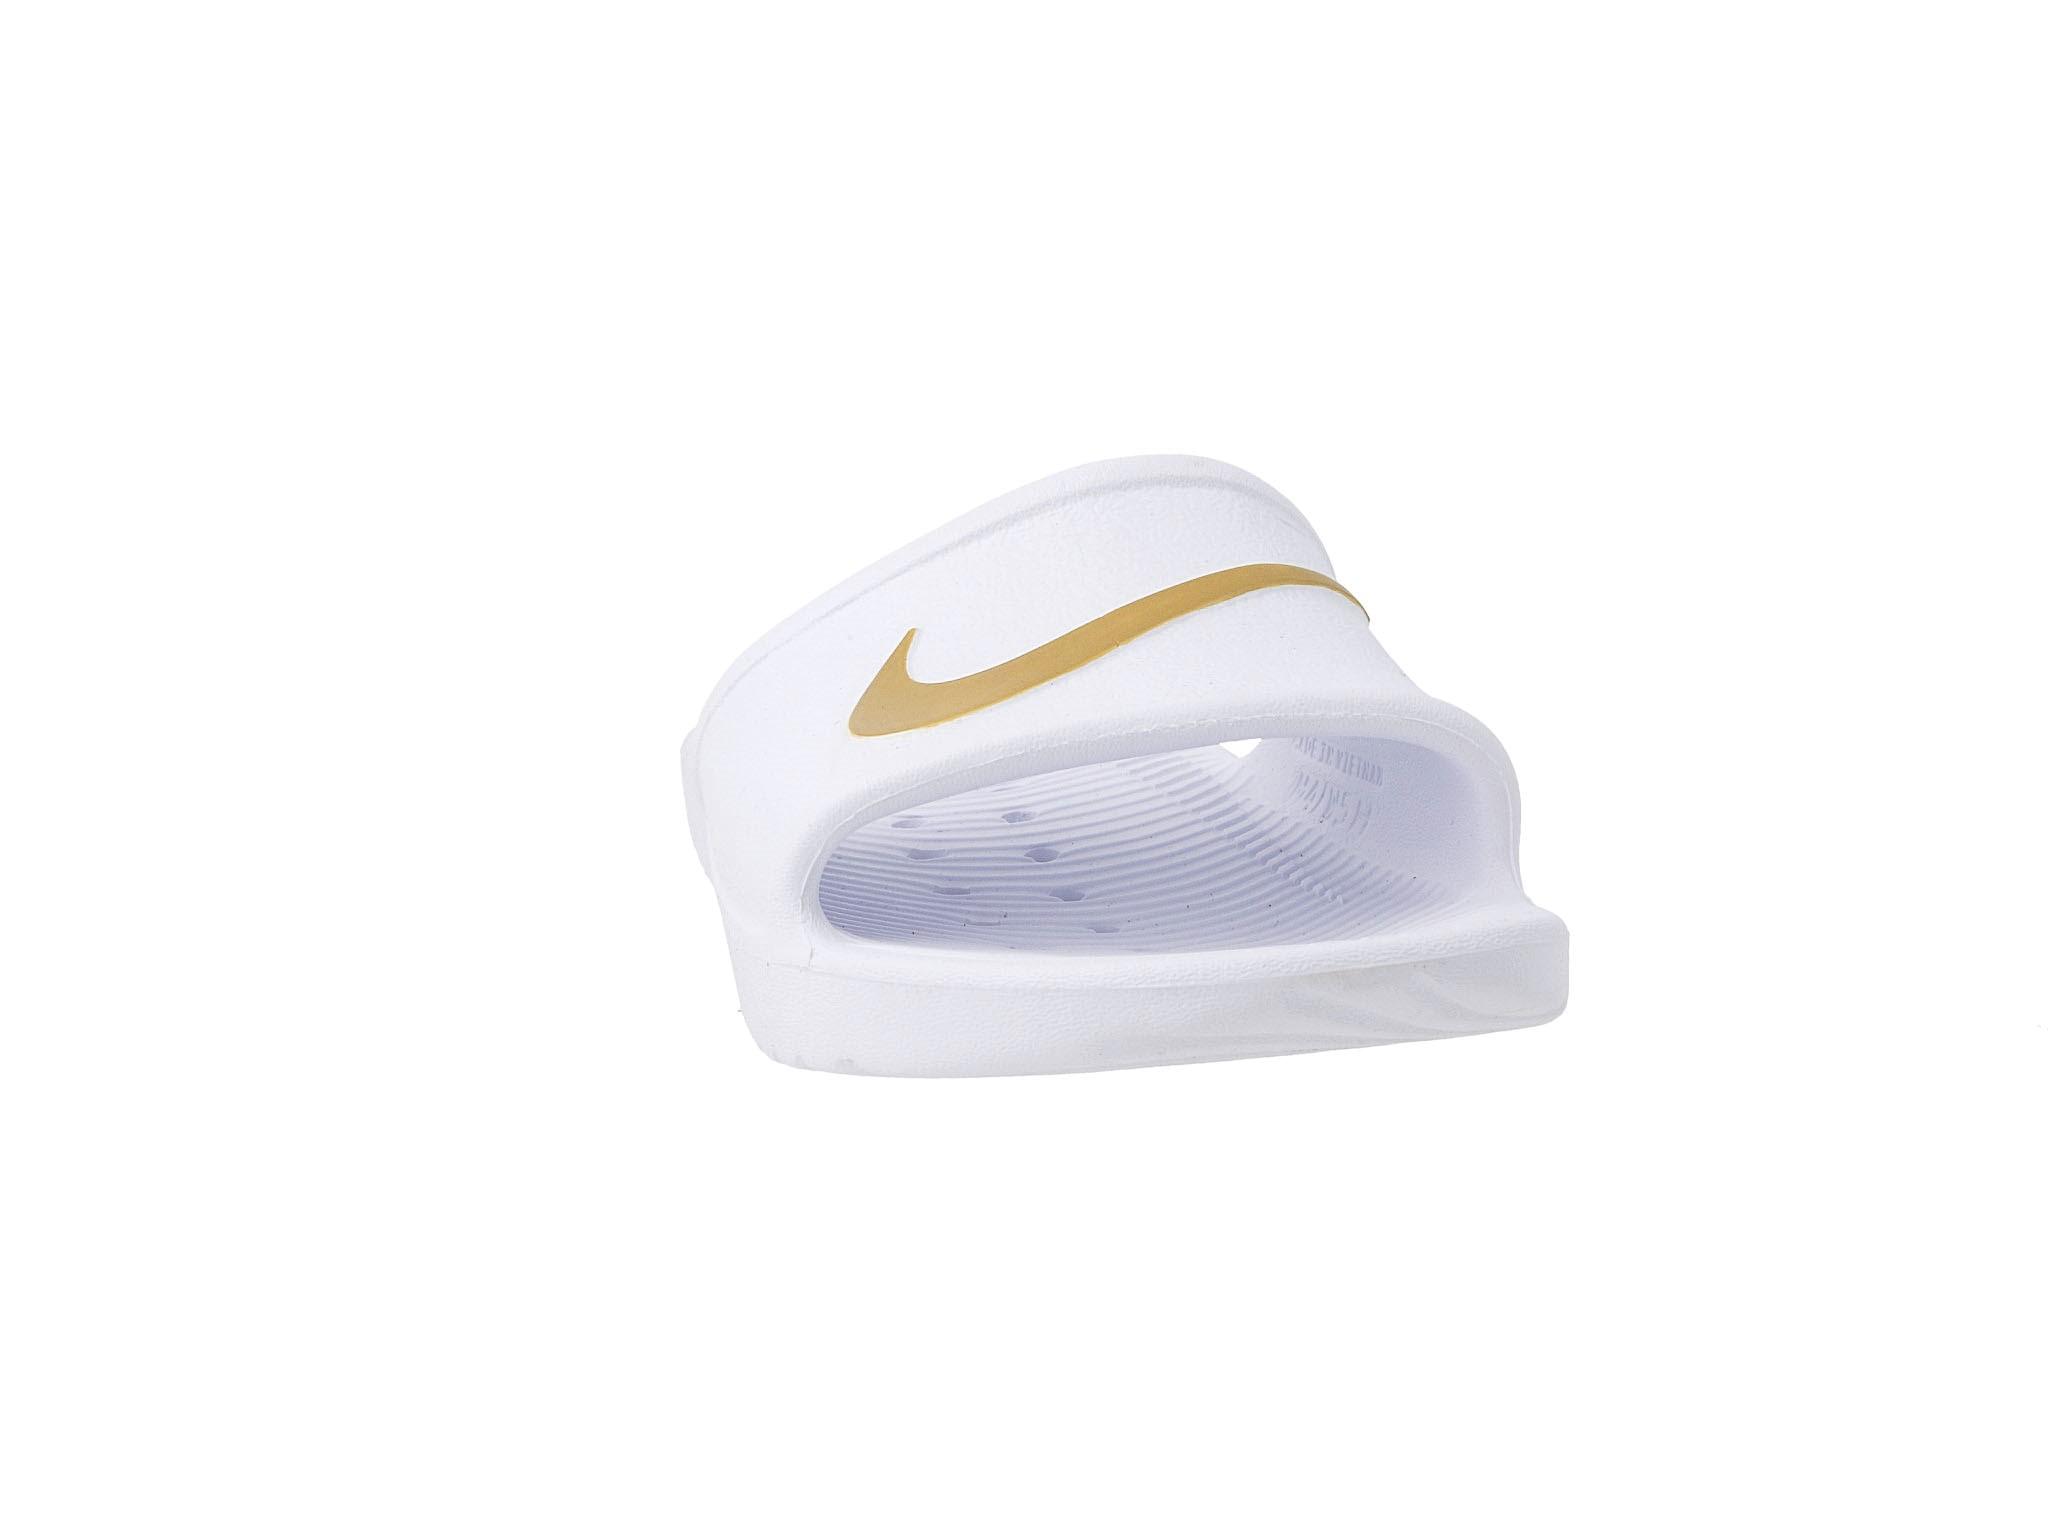 Papucs NIKE Kawa Shower 832655 101 WhiteMetallic Gold